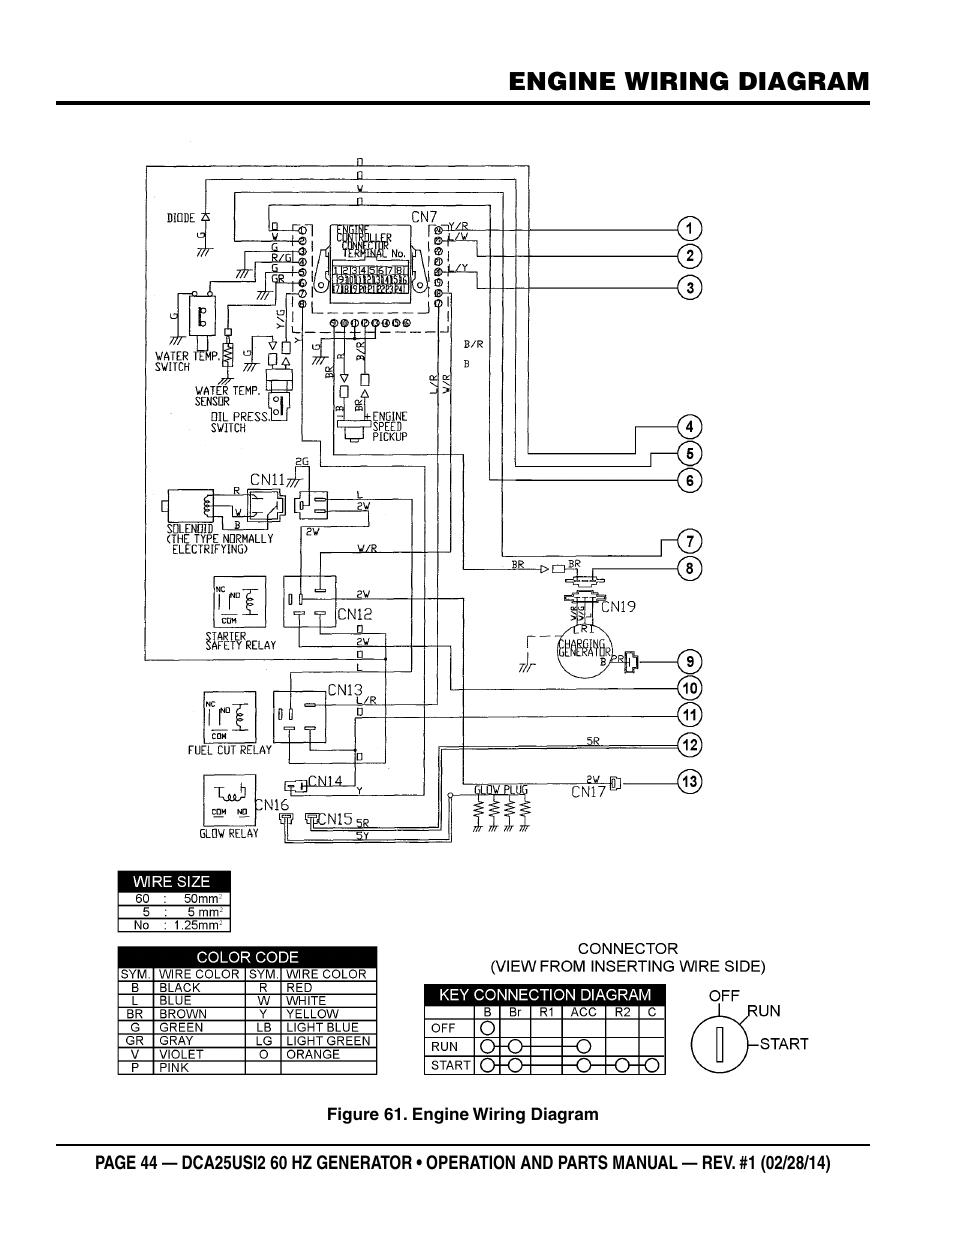 User's manual of Kenwood Radio Wiring Diagram User's Guide